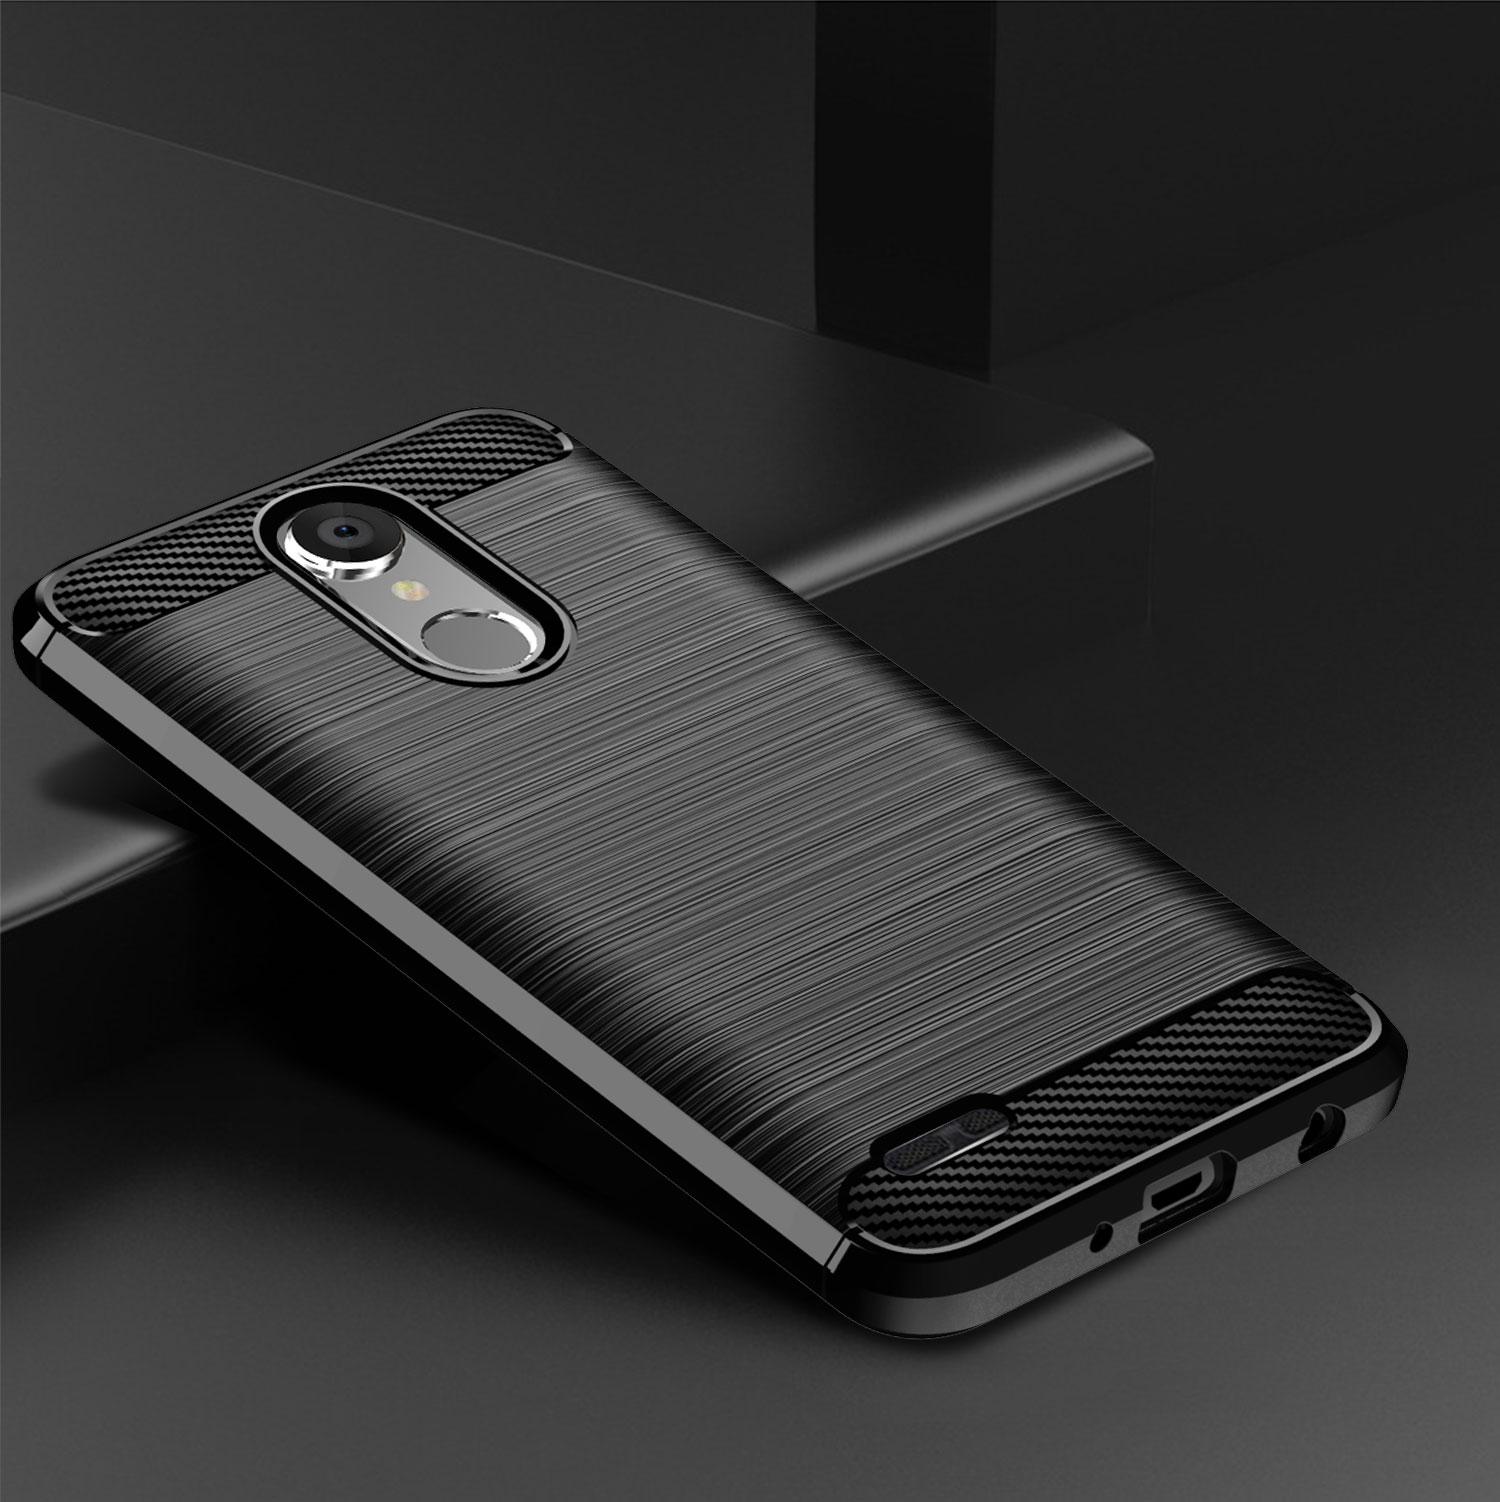 Caso para LG Stylo 5 4 G7 ThinQ G8 G6 Plus alfa uno K40 K50 K8S G8X G8S Q70 W10 W30 K50S V60 de fibra de carbono de la cubierta de la caja del teléfono